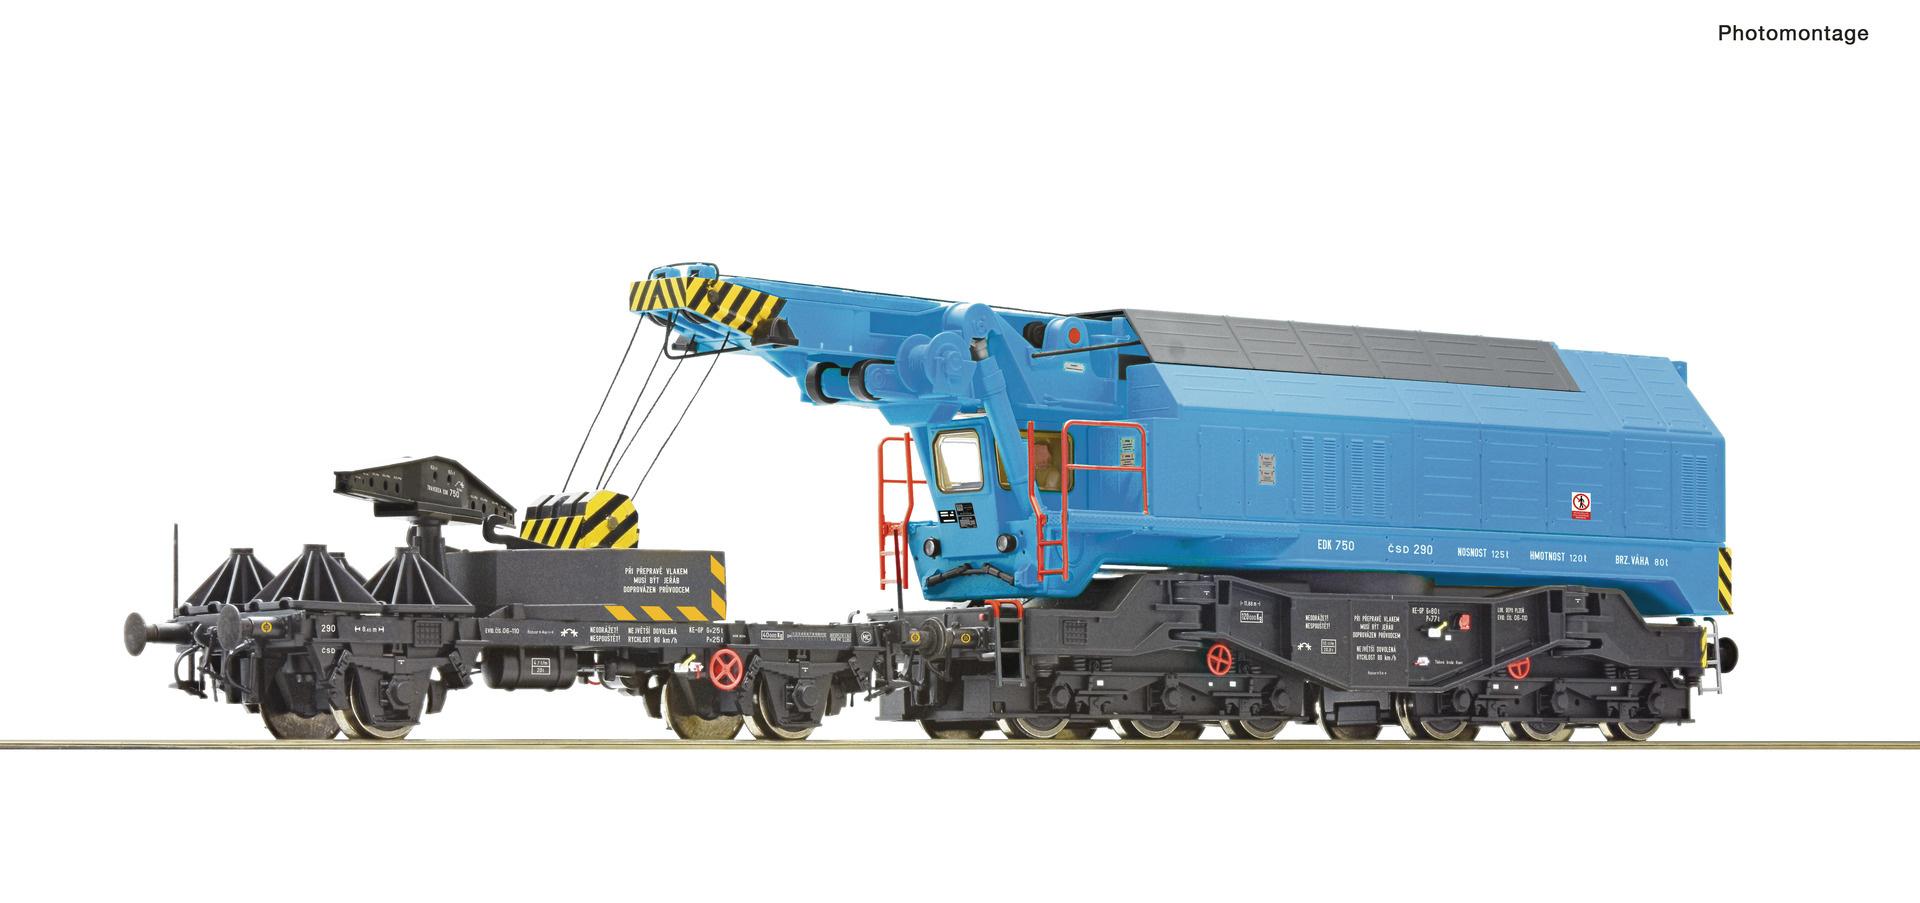 73038 Digitalkran EDK 750 CSD-1